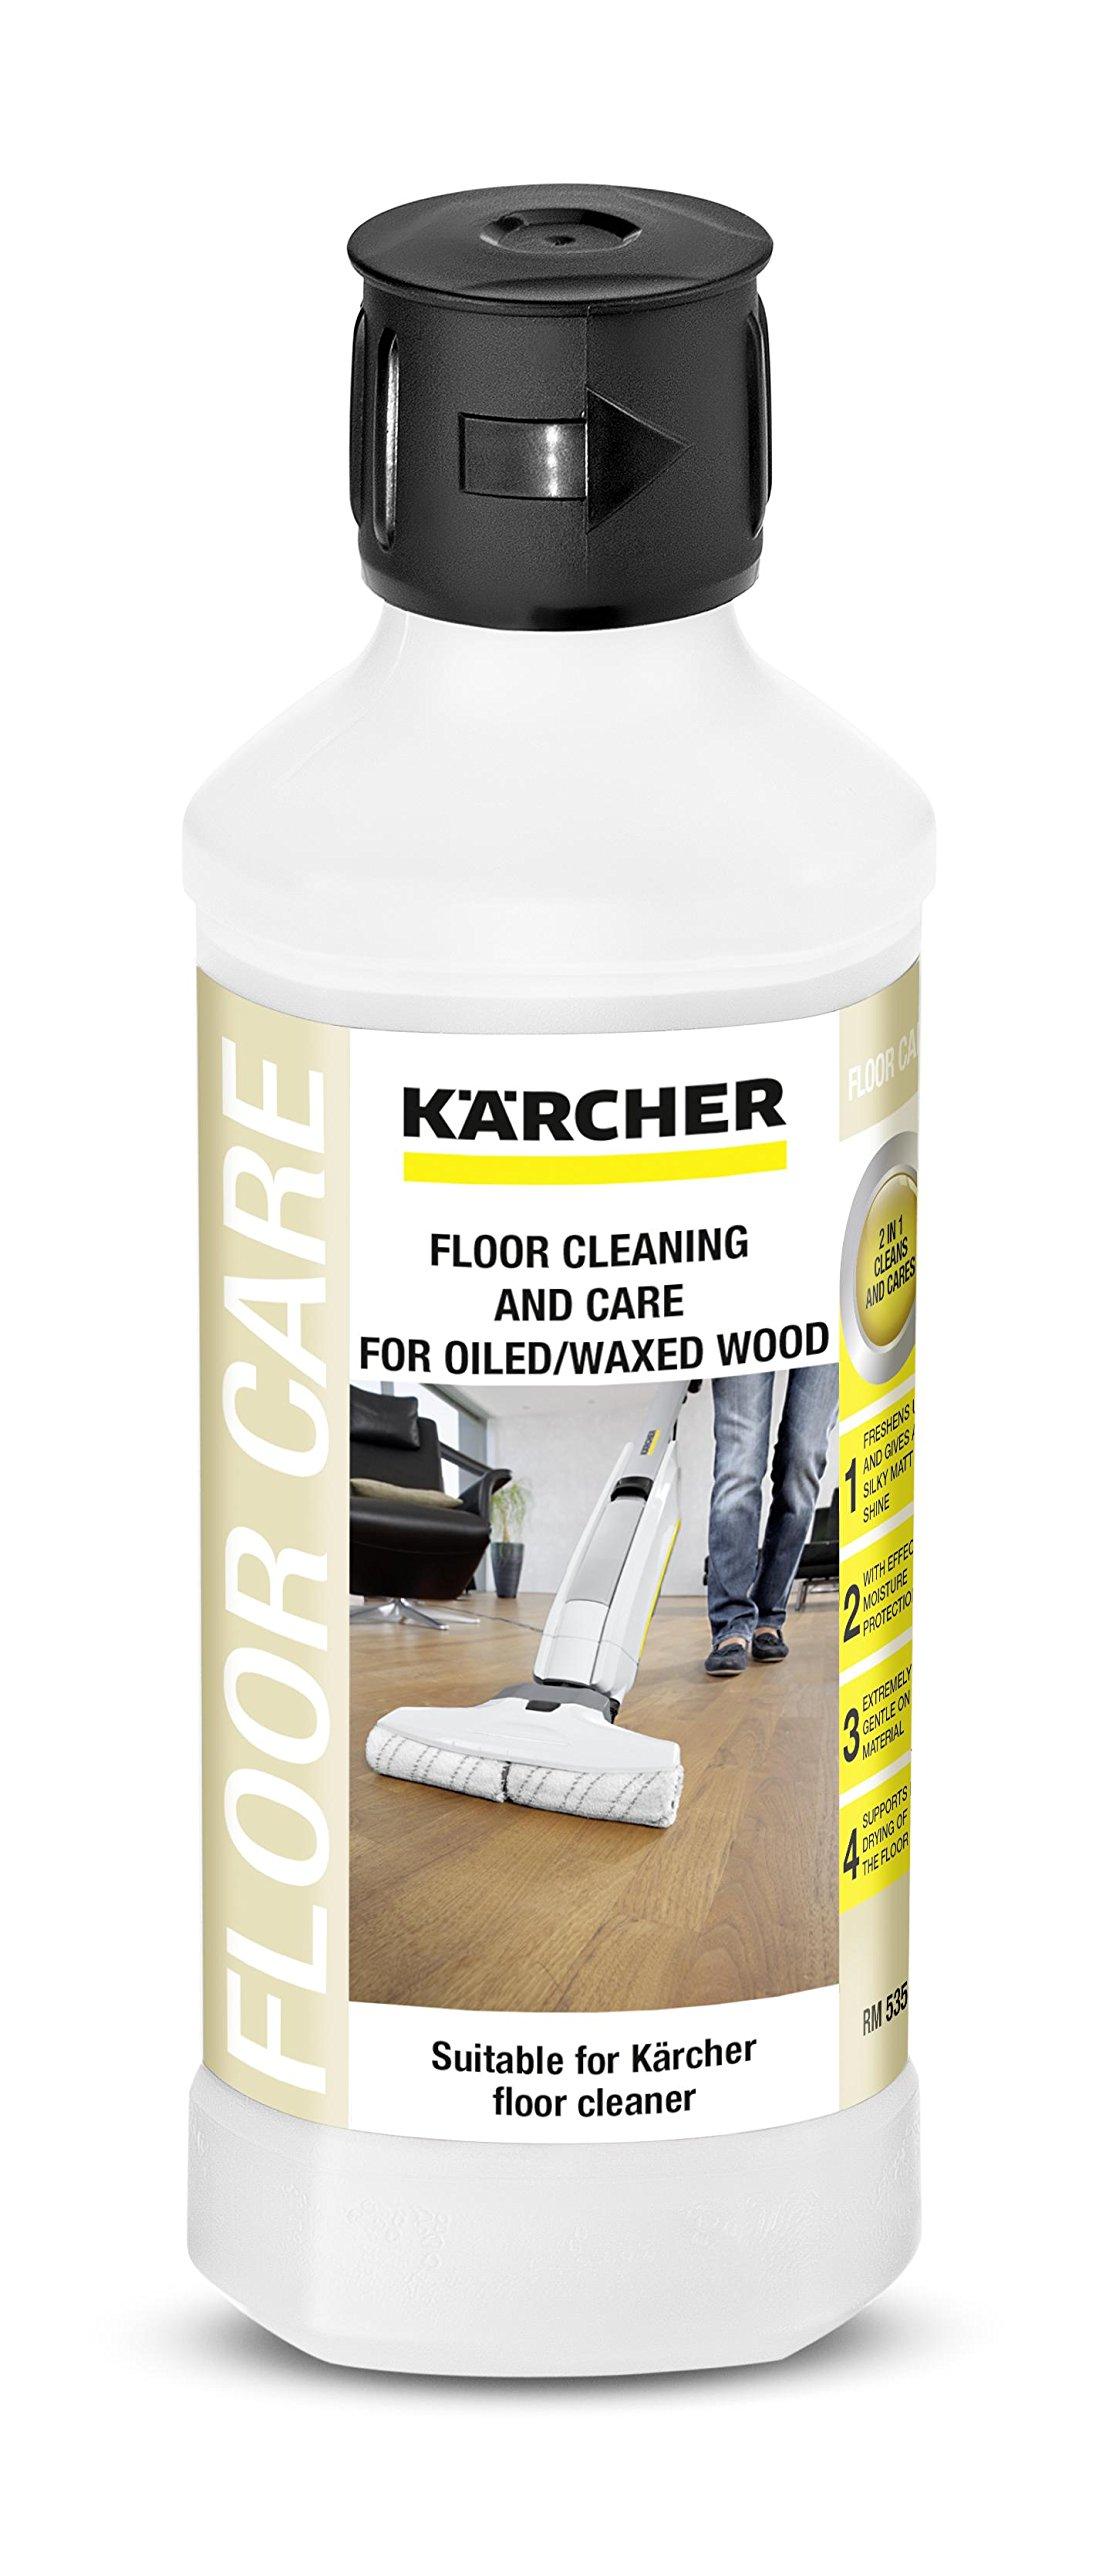 Krcher-6295-9420-Bodenpflege-Holz-geltgewachst-RM-535